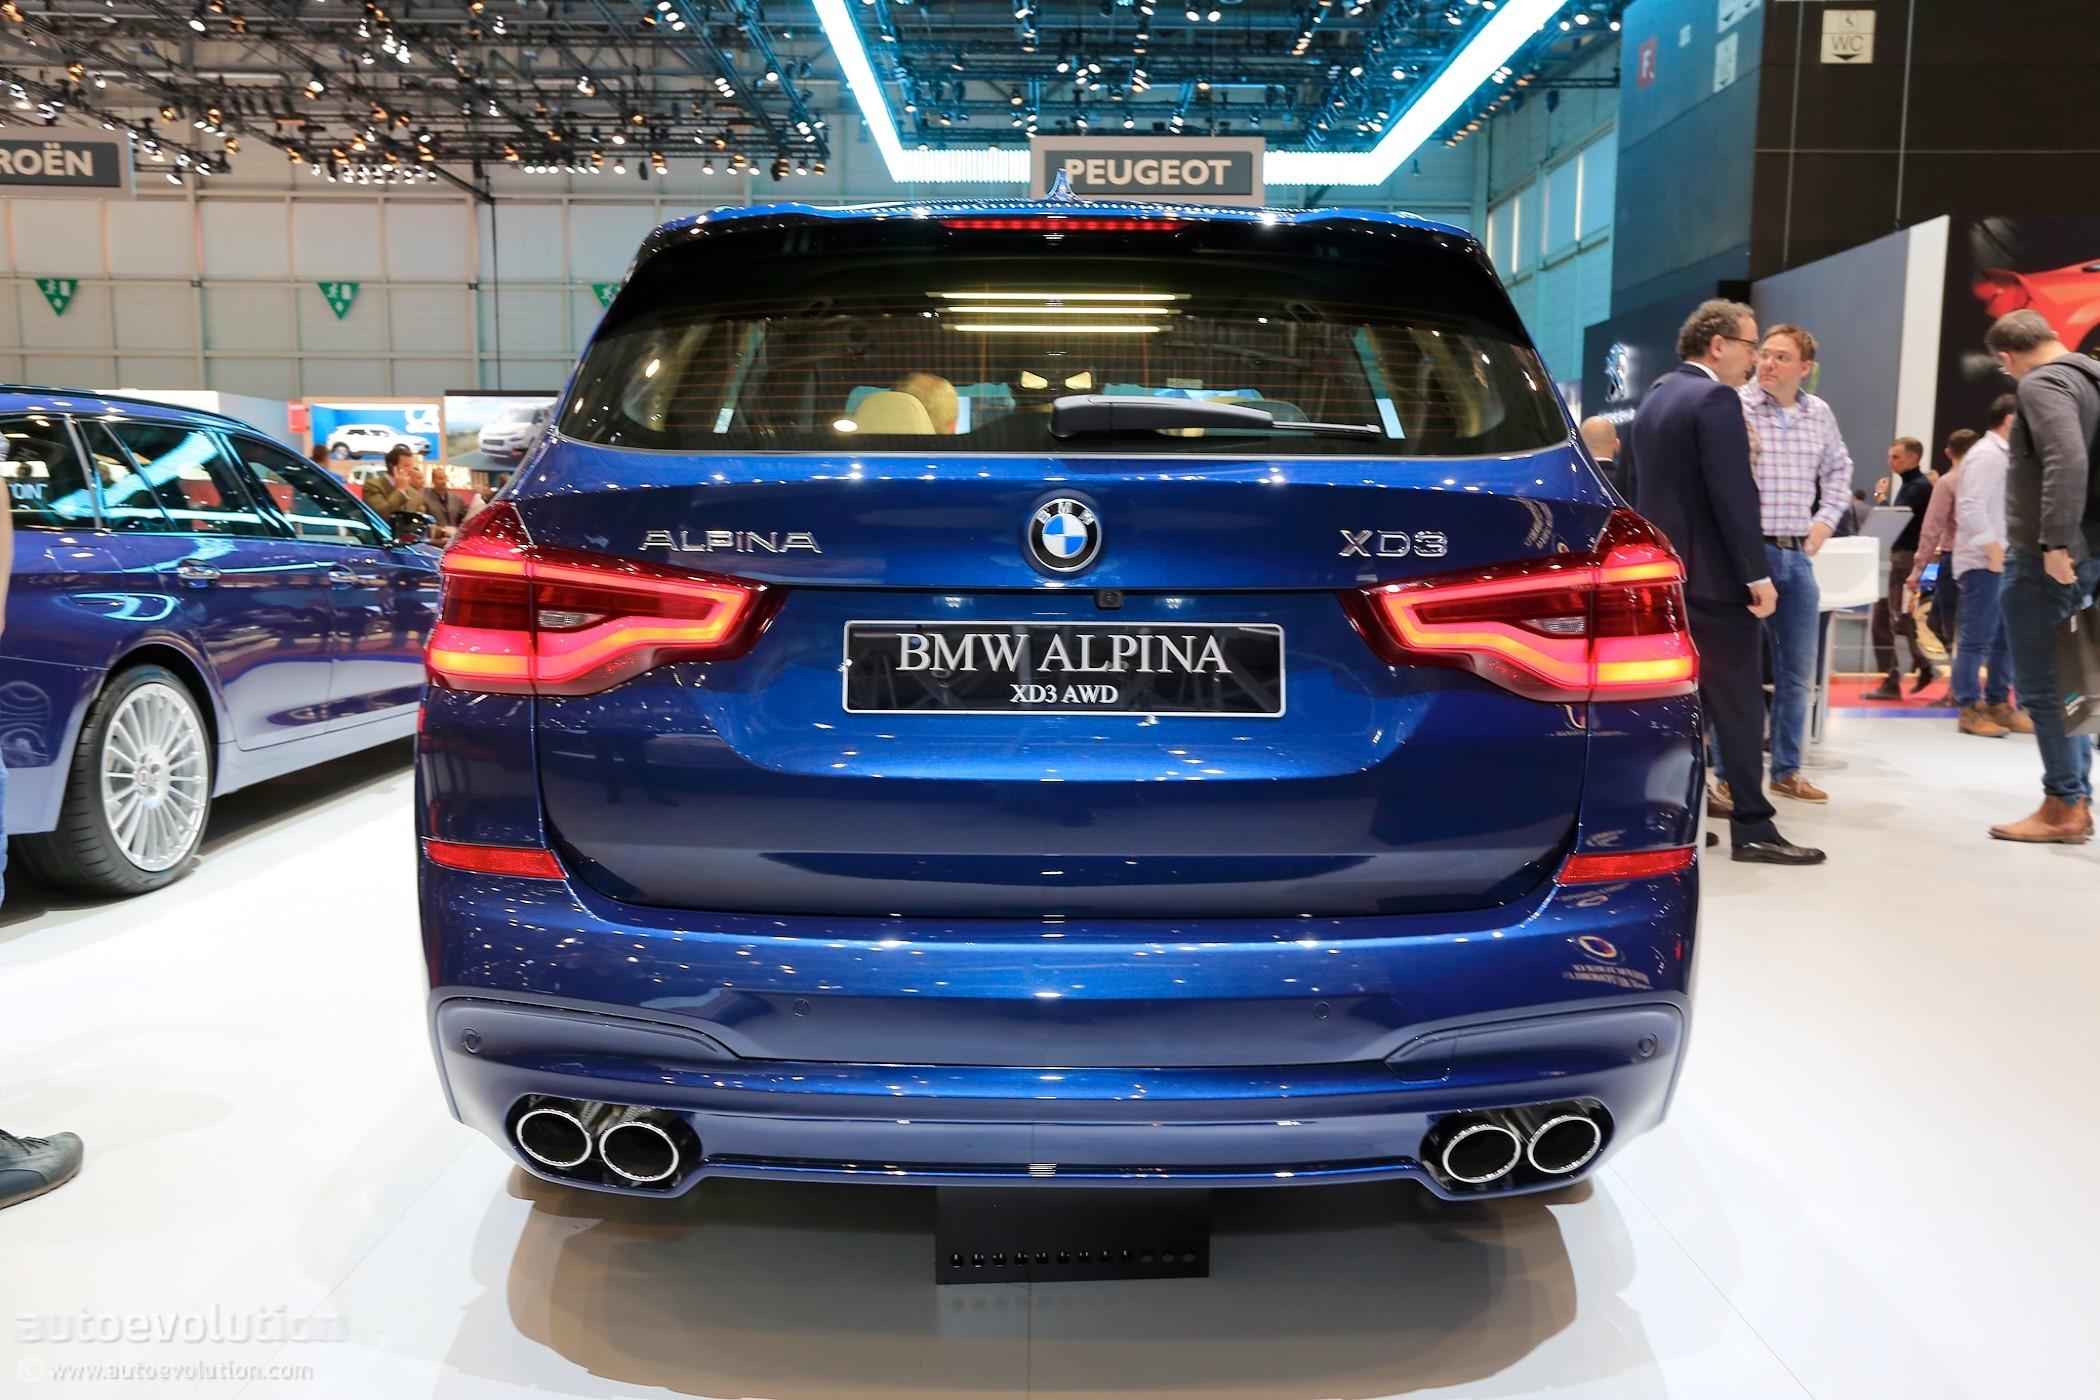 BMW Alpina B Biturbo Allrad To Debut At The NYIAS Autoevolution - X5 alpina